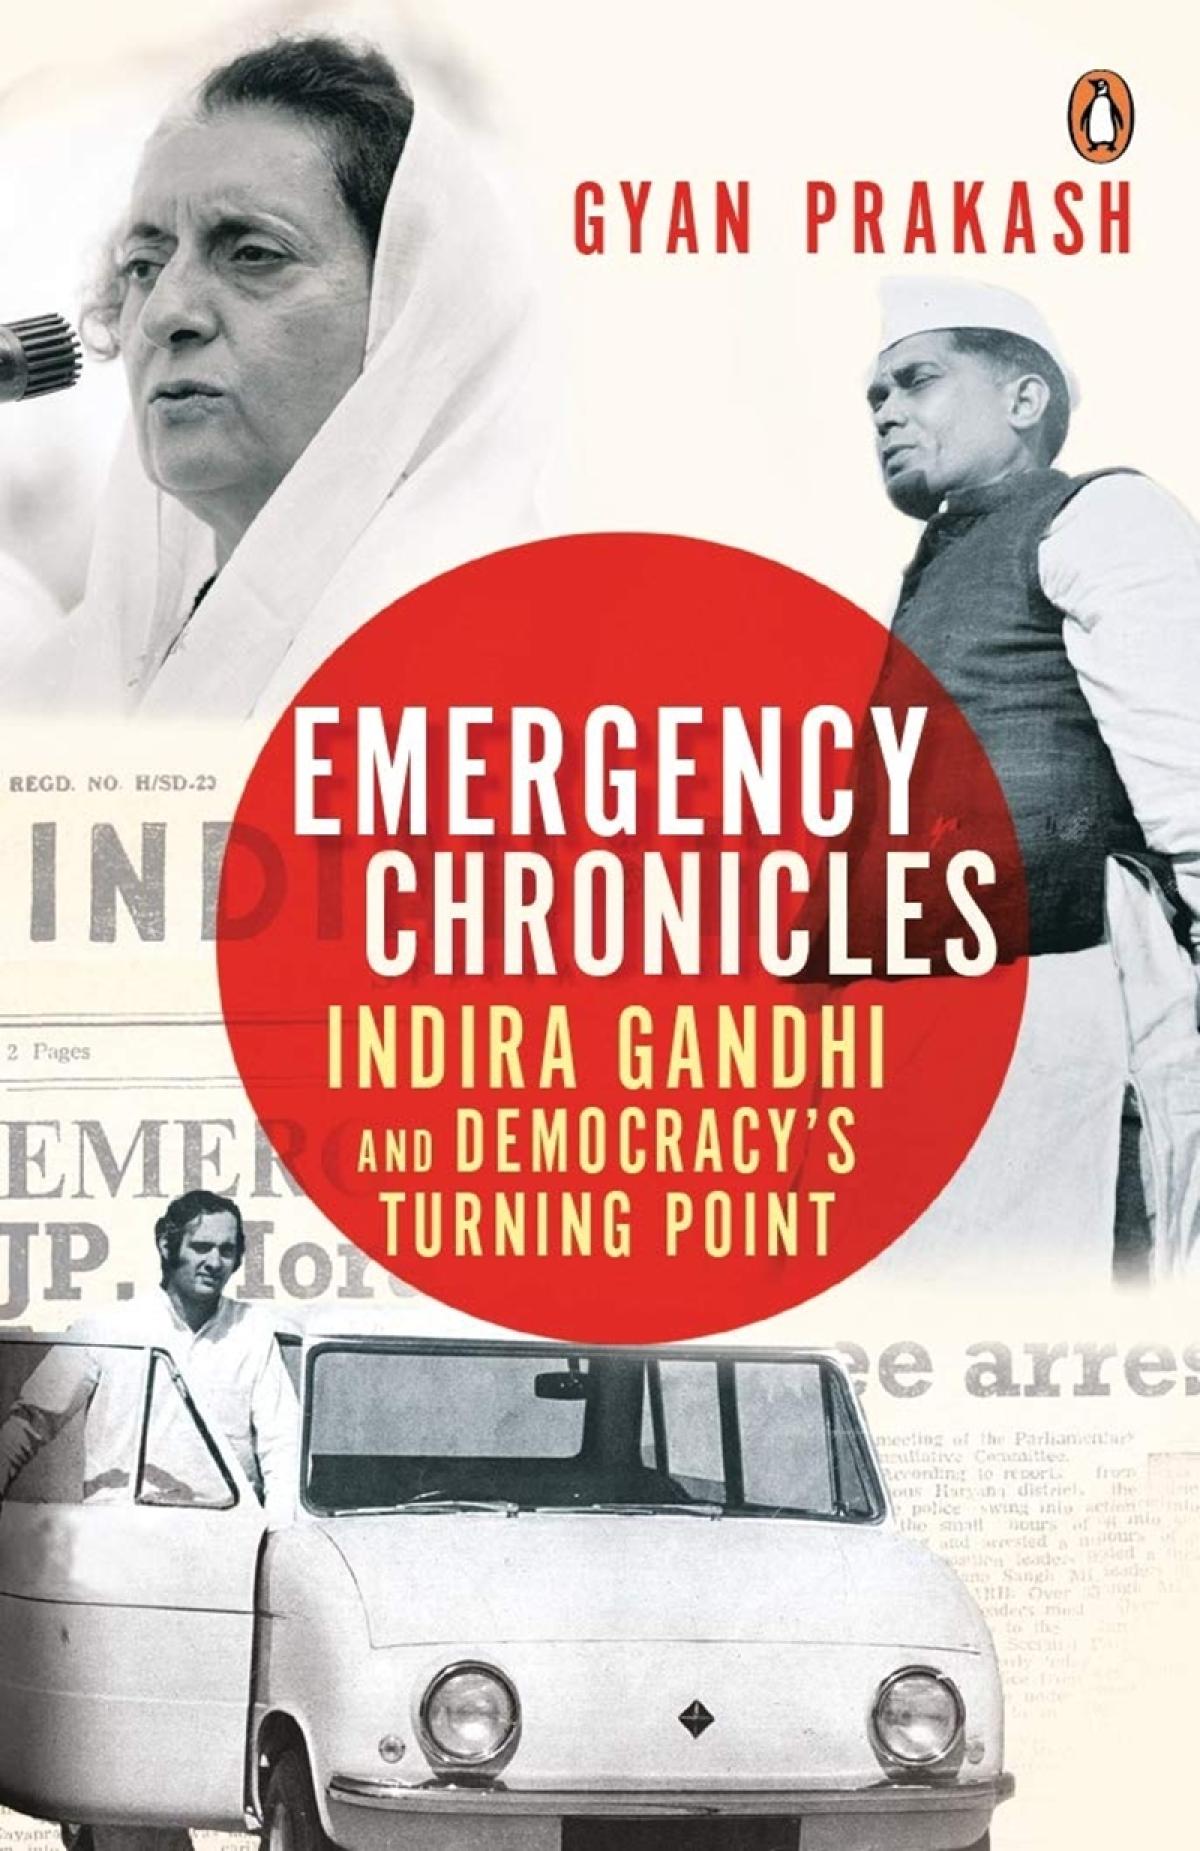 Emergency Chronicles: Indira Gandhi and Democracy's Turning Point by Gyan Prakash- Review